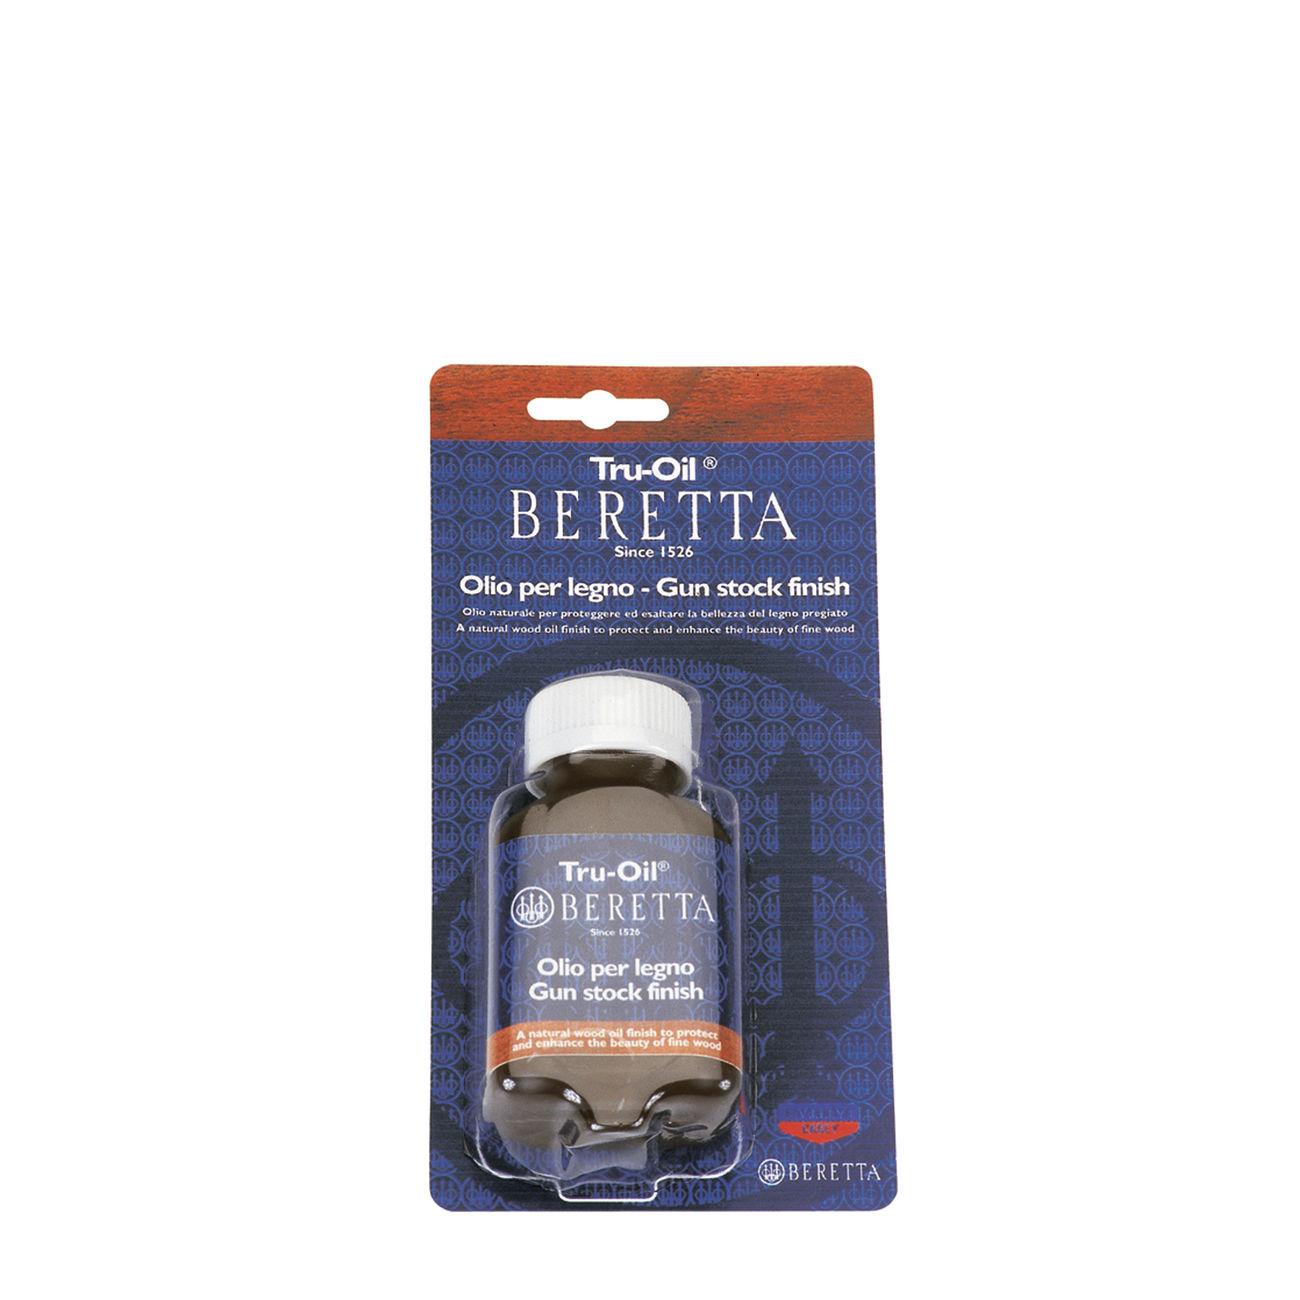 Beretta Schaftol Tru Oil 90ml Holz Pflegemittel Gunstig Kaufen